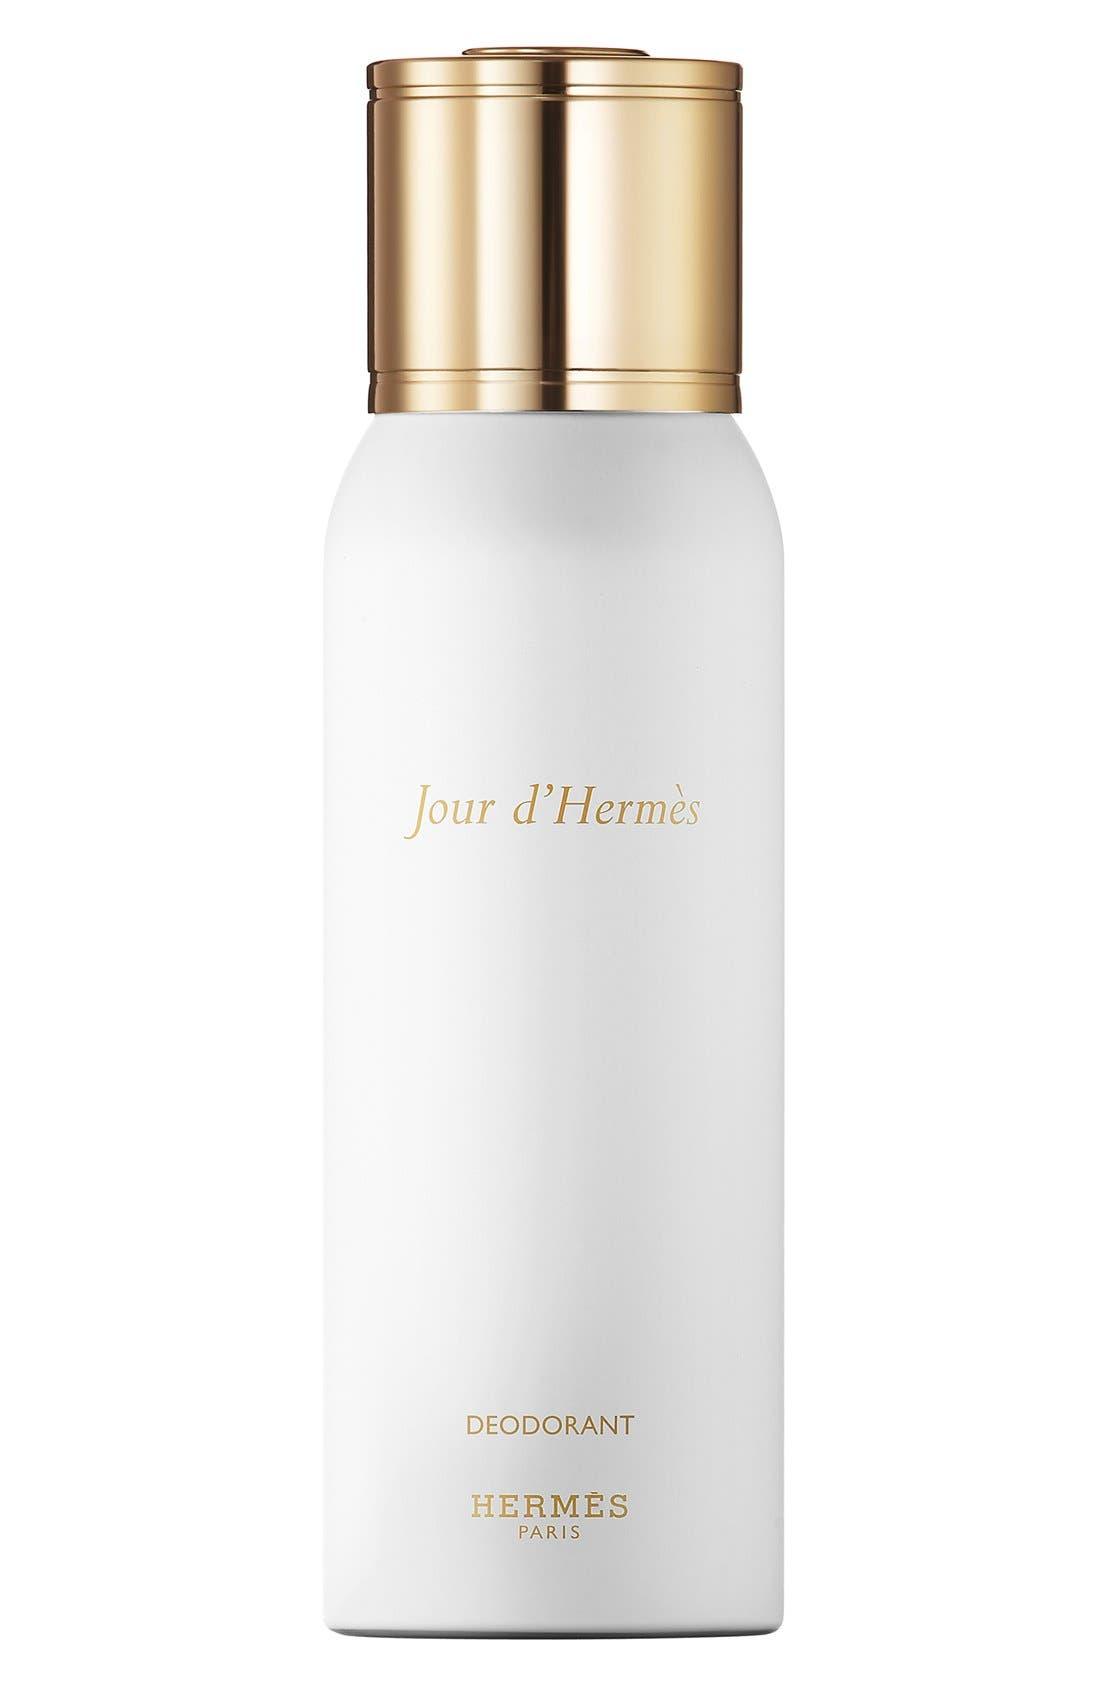 Hermès Jour d'Hermès - Deodorant natural spray